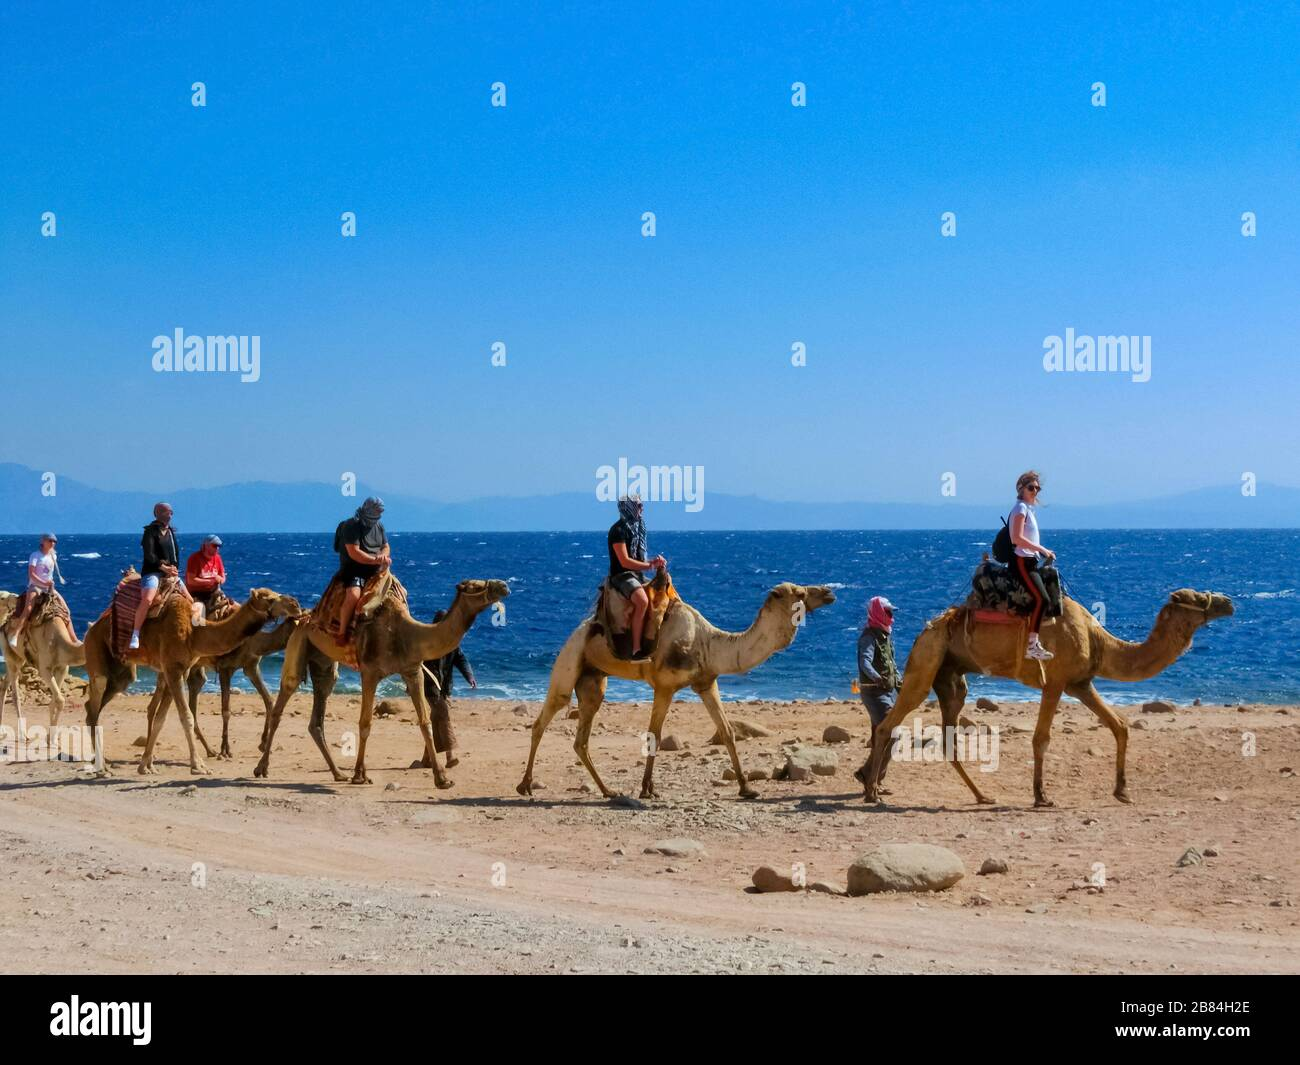 Sharm El Sheikh Egypt February 17 2020 Tourist Rides Camel On Beach With Help Of Egyptian Man On February 17 2020 In Sharm El Sheikh Egypt Stock Photo Alamy